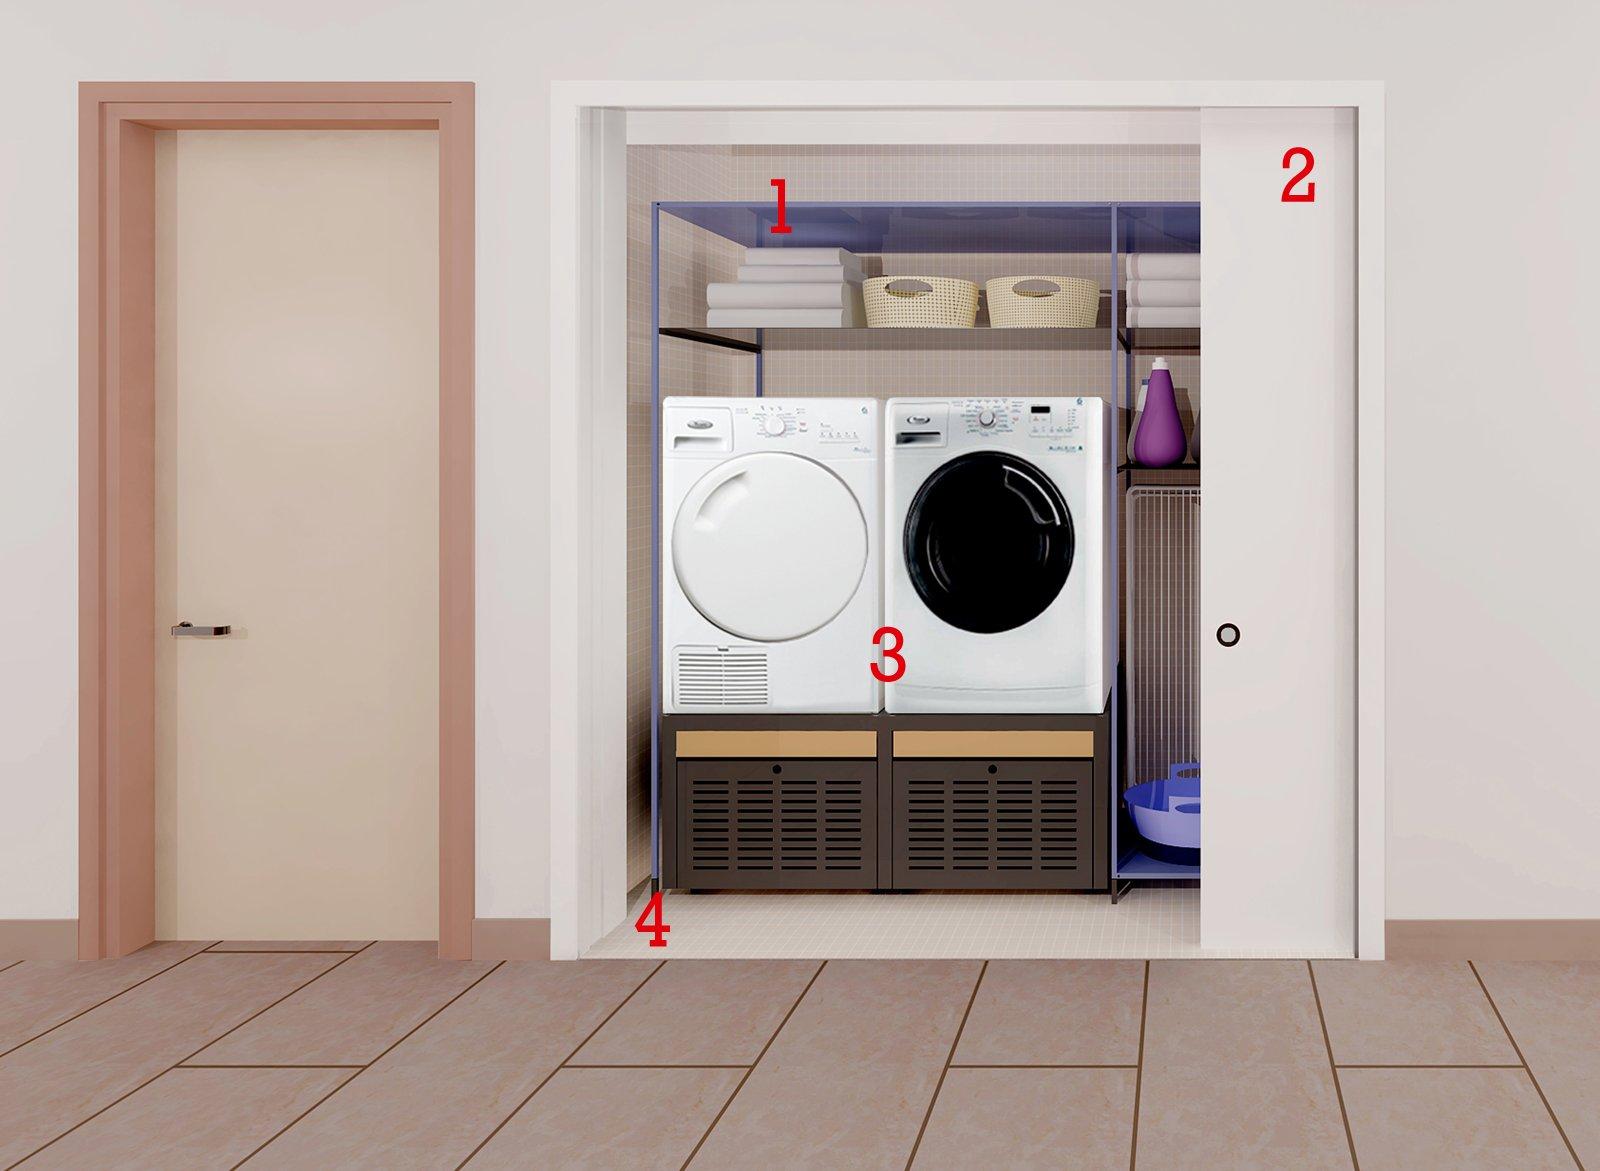 Arredamento per lavanderia casa: arredare la lavanderia di casa ...